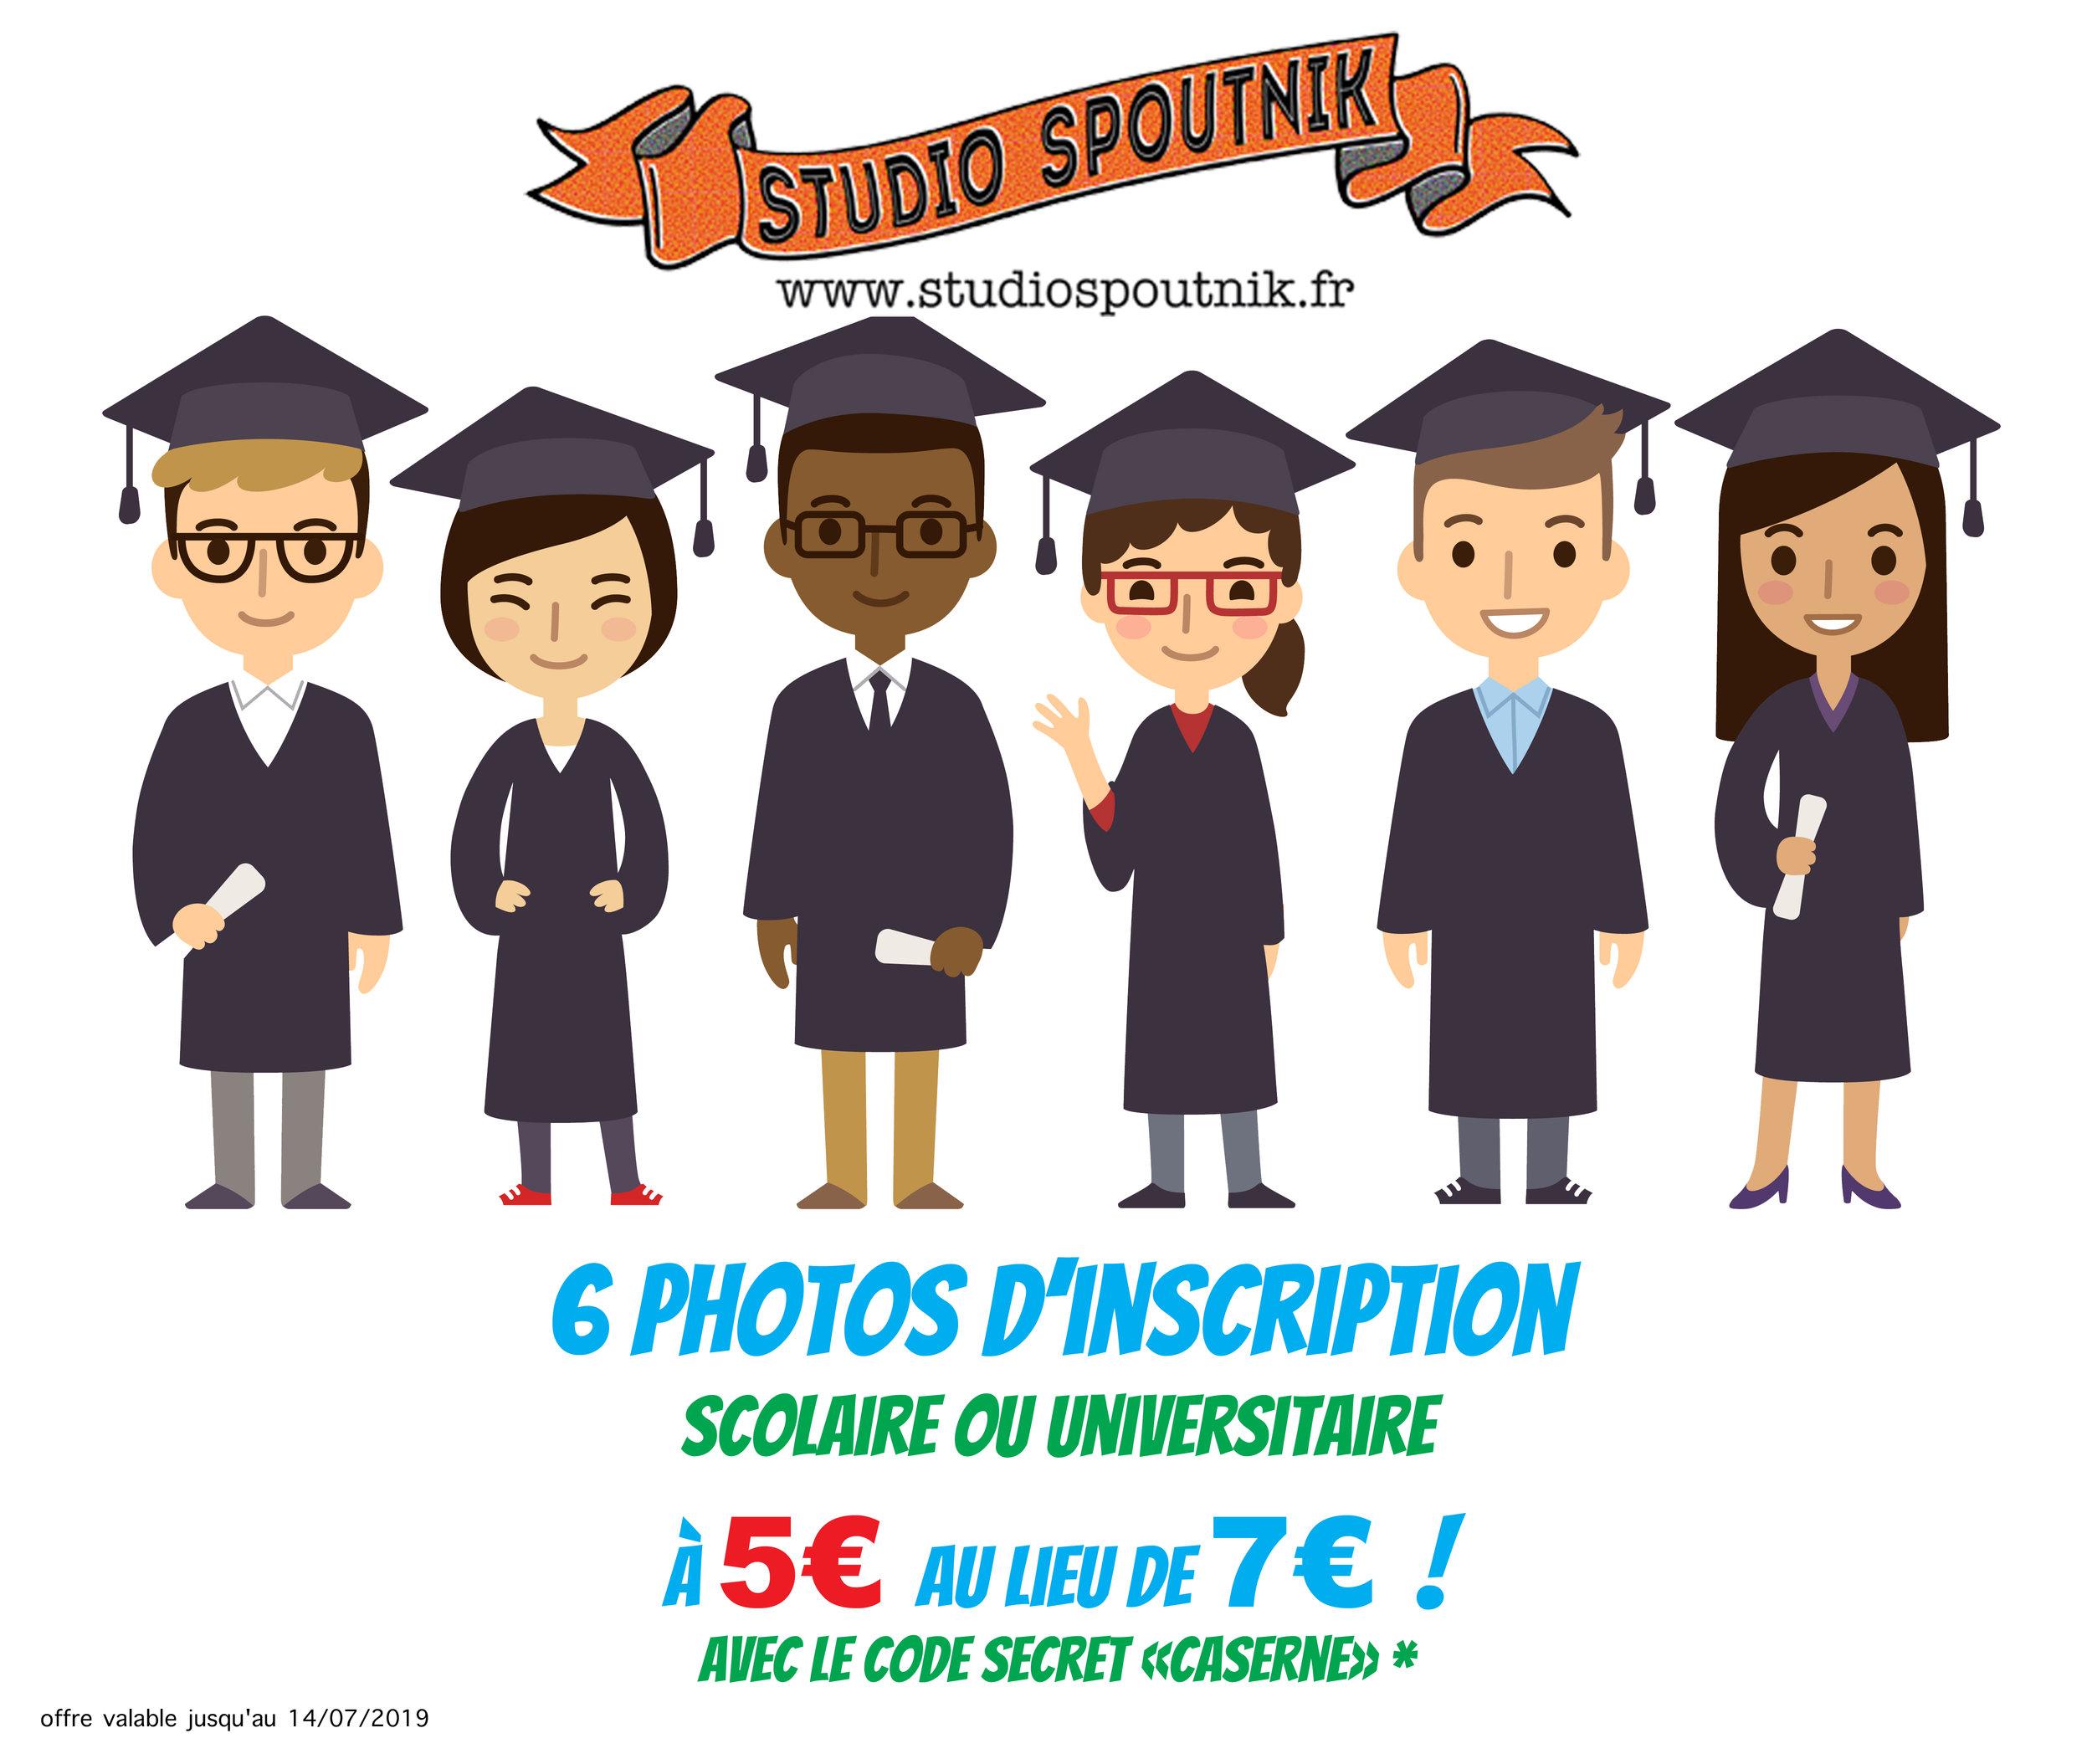 promo photos inscription scolaire